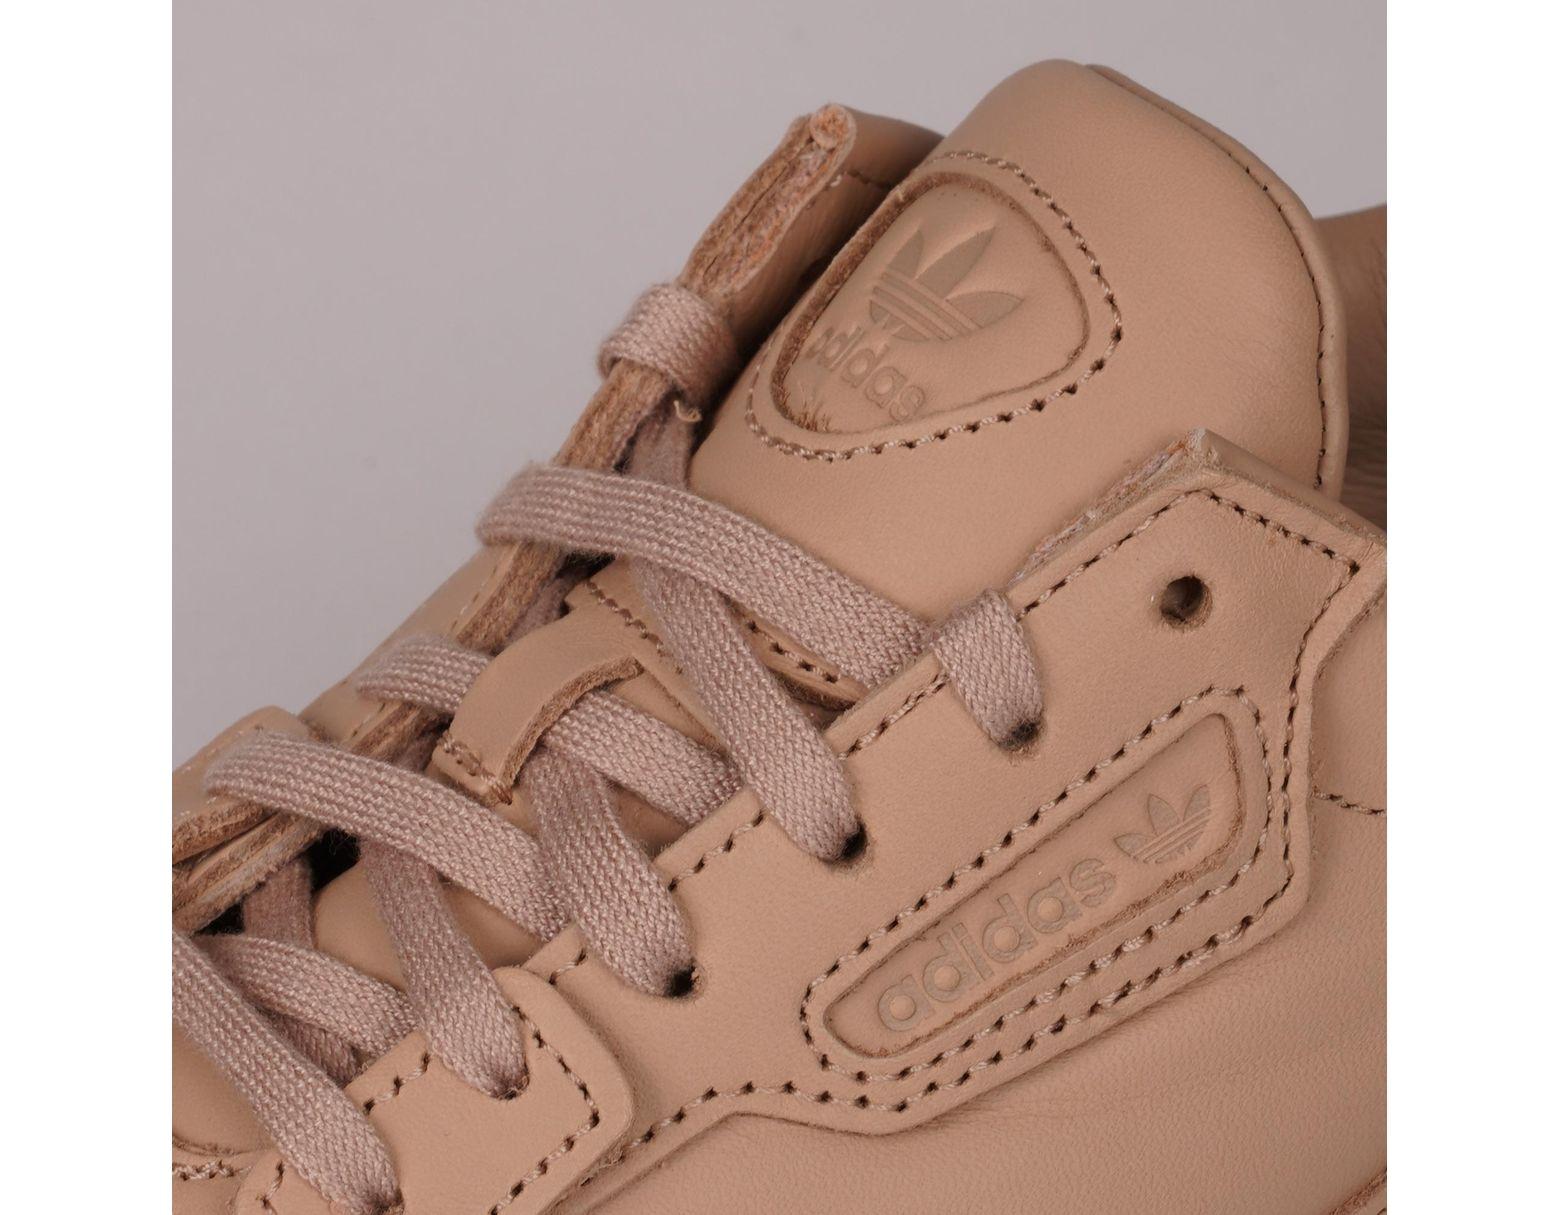 49224add659ab6 adidas Originals Falcon - Ash Pearl & Off White in Pink - Lyst